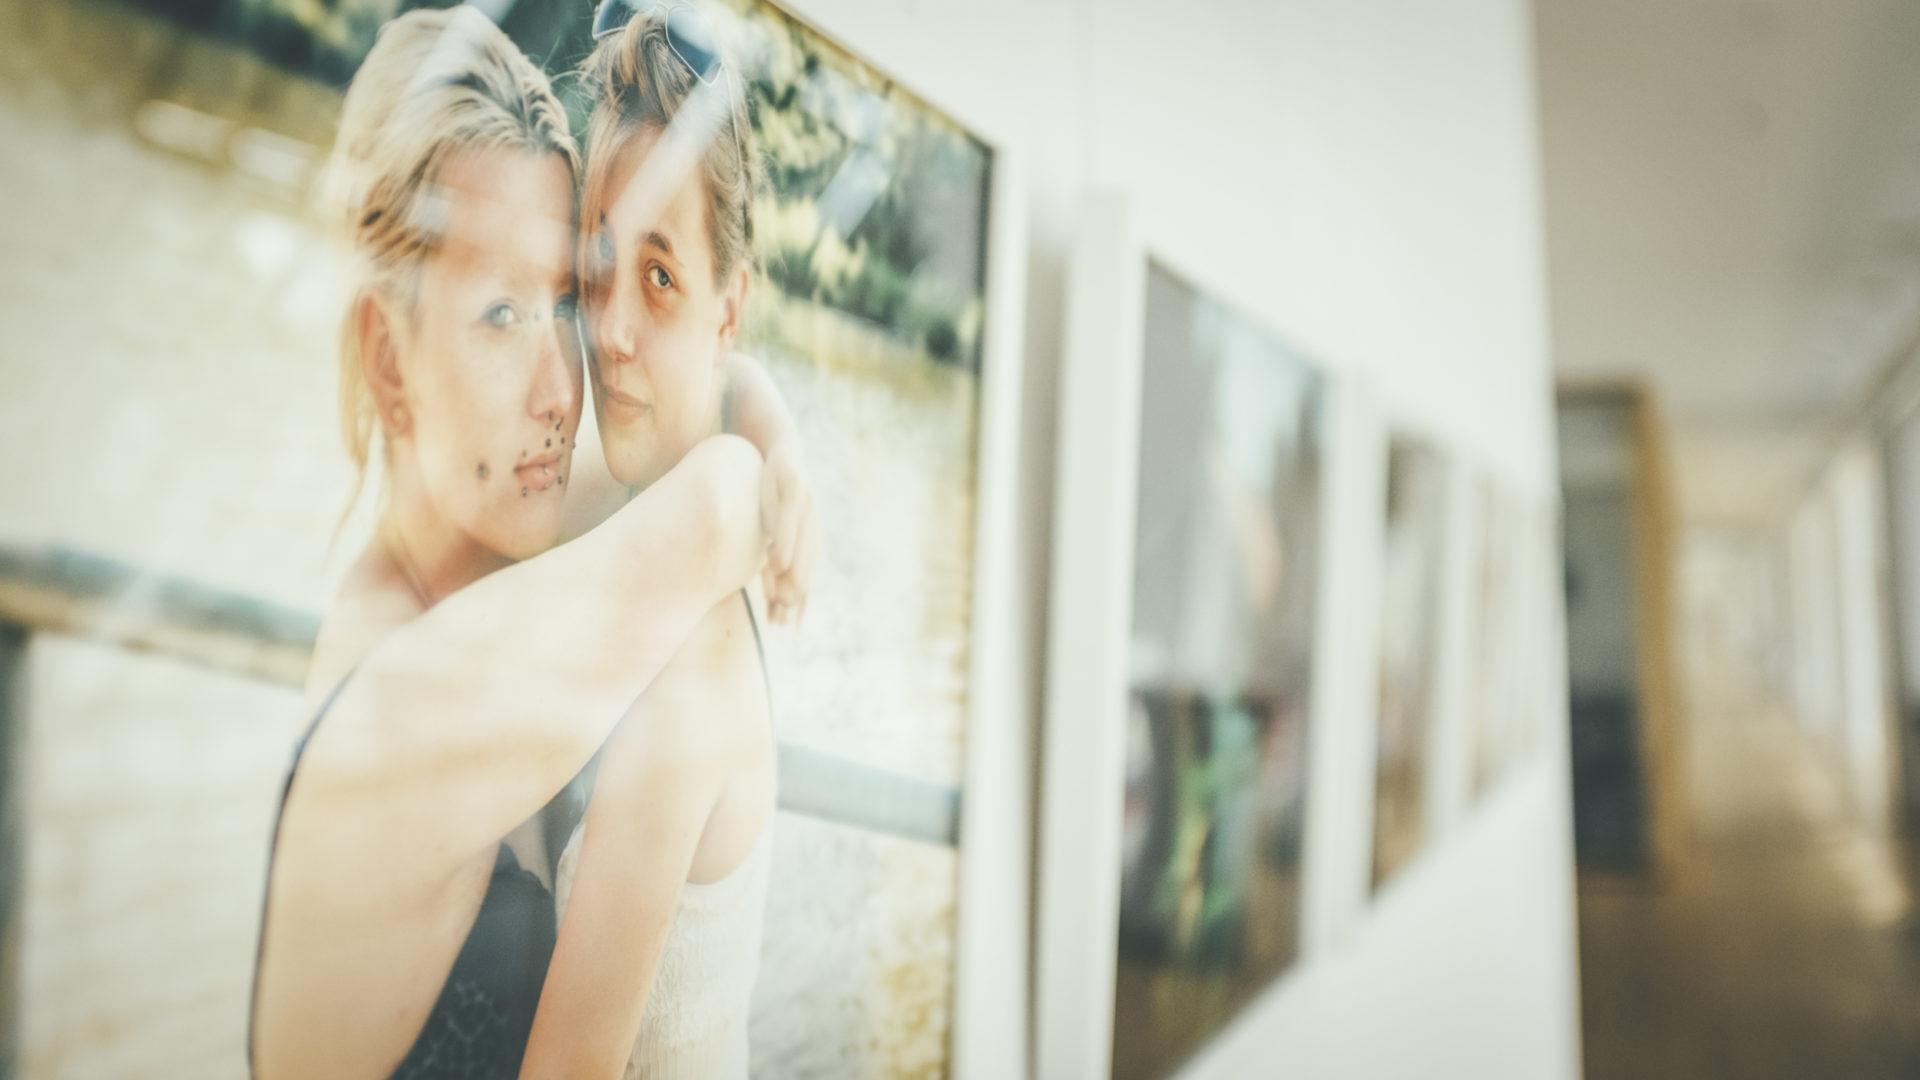 Ausstellung Neuaufnahmen Pixelprojekt Ruhrgebiet 2020. Foto: KNSY